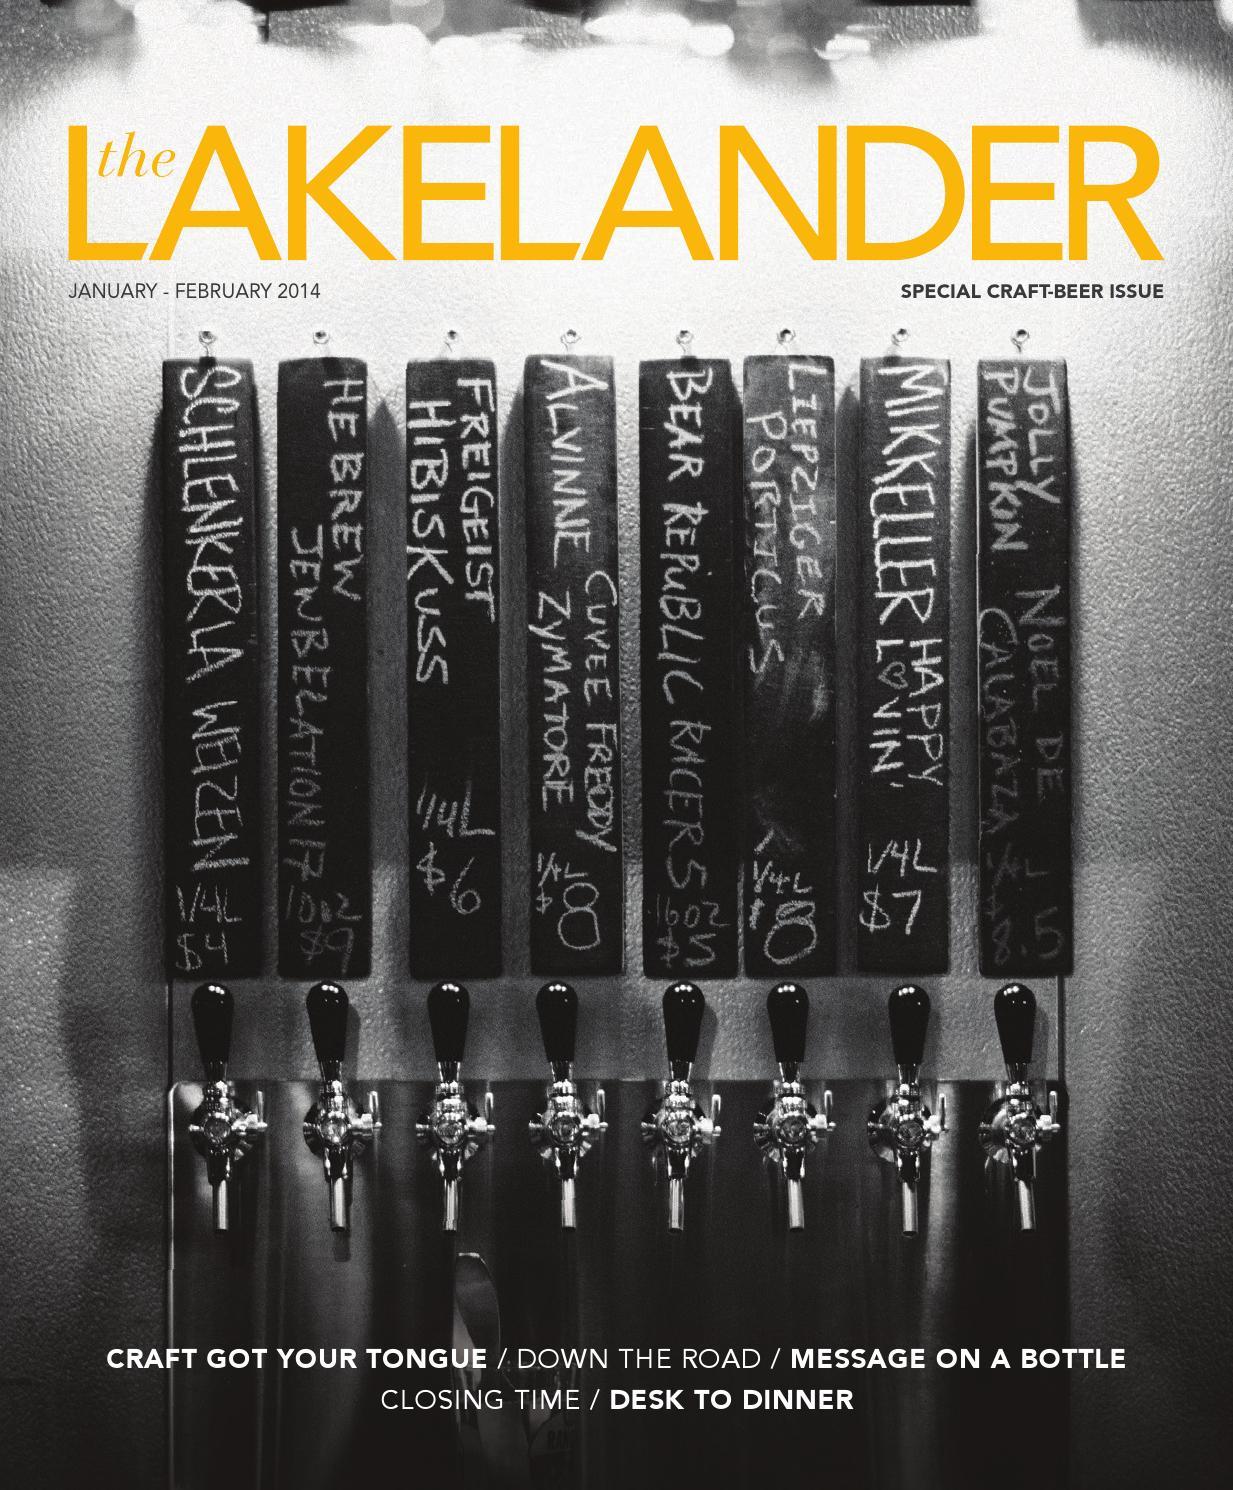 2fca282c39f The Lakelander - SPECIAL CRAFT-BEER ISSUE